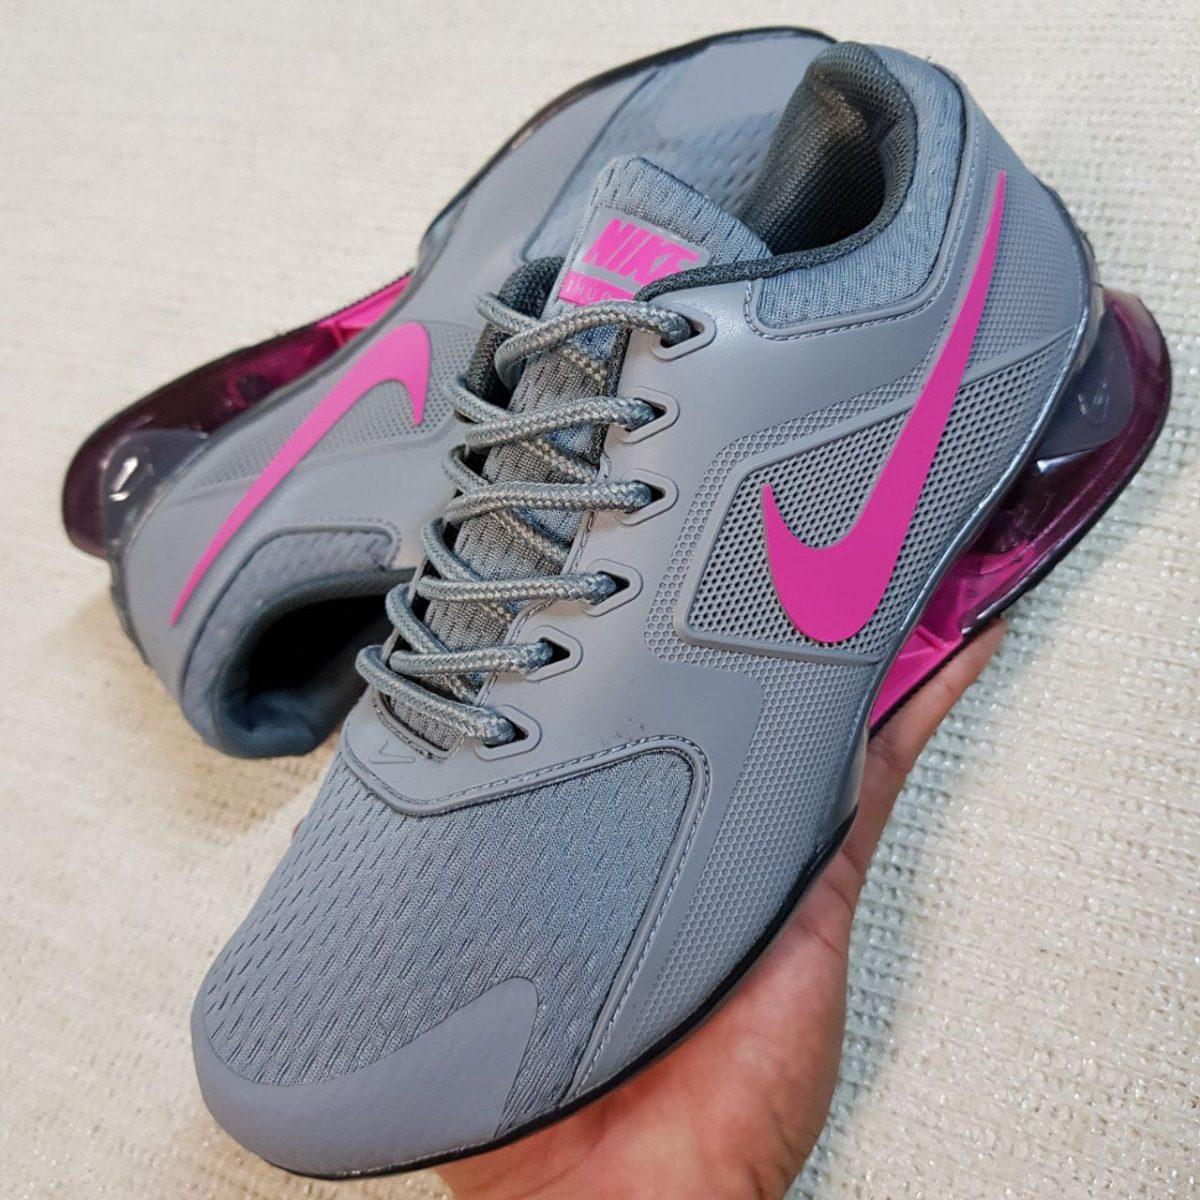 ad116afb5b5 Tenis Nike Thudor 2018 Para Mujer -   159.900 en Mercado Libre